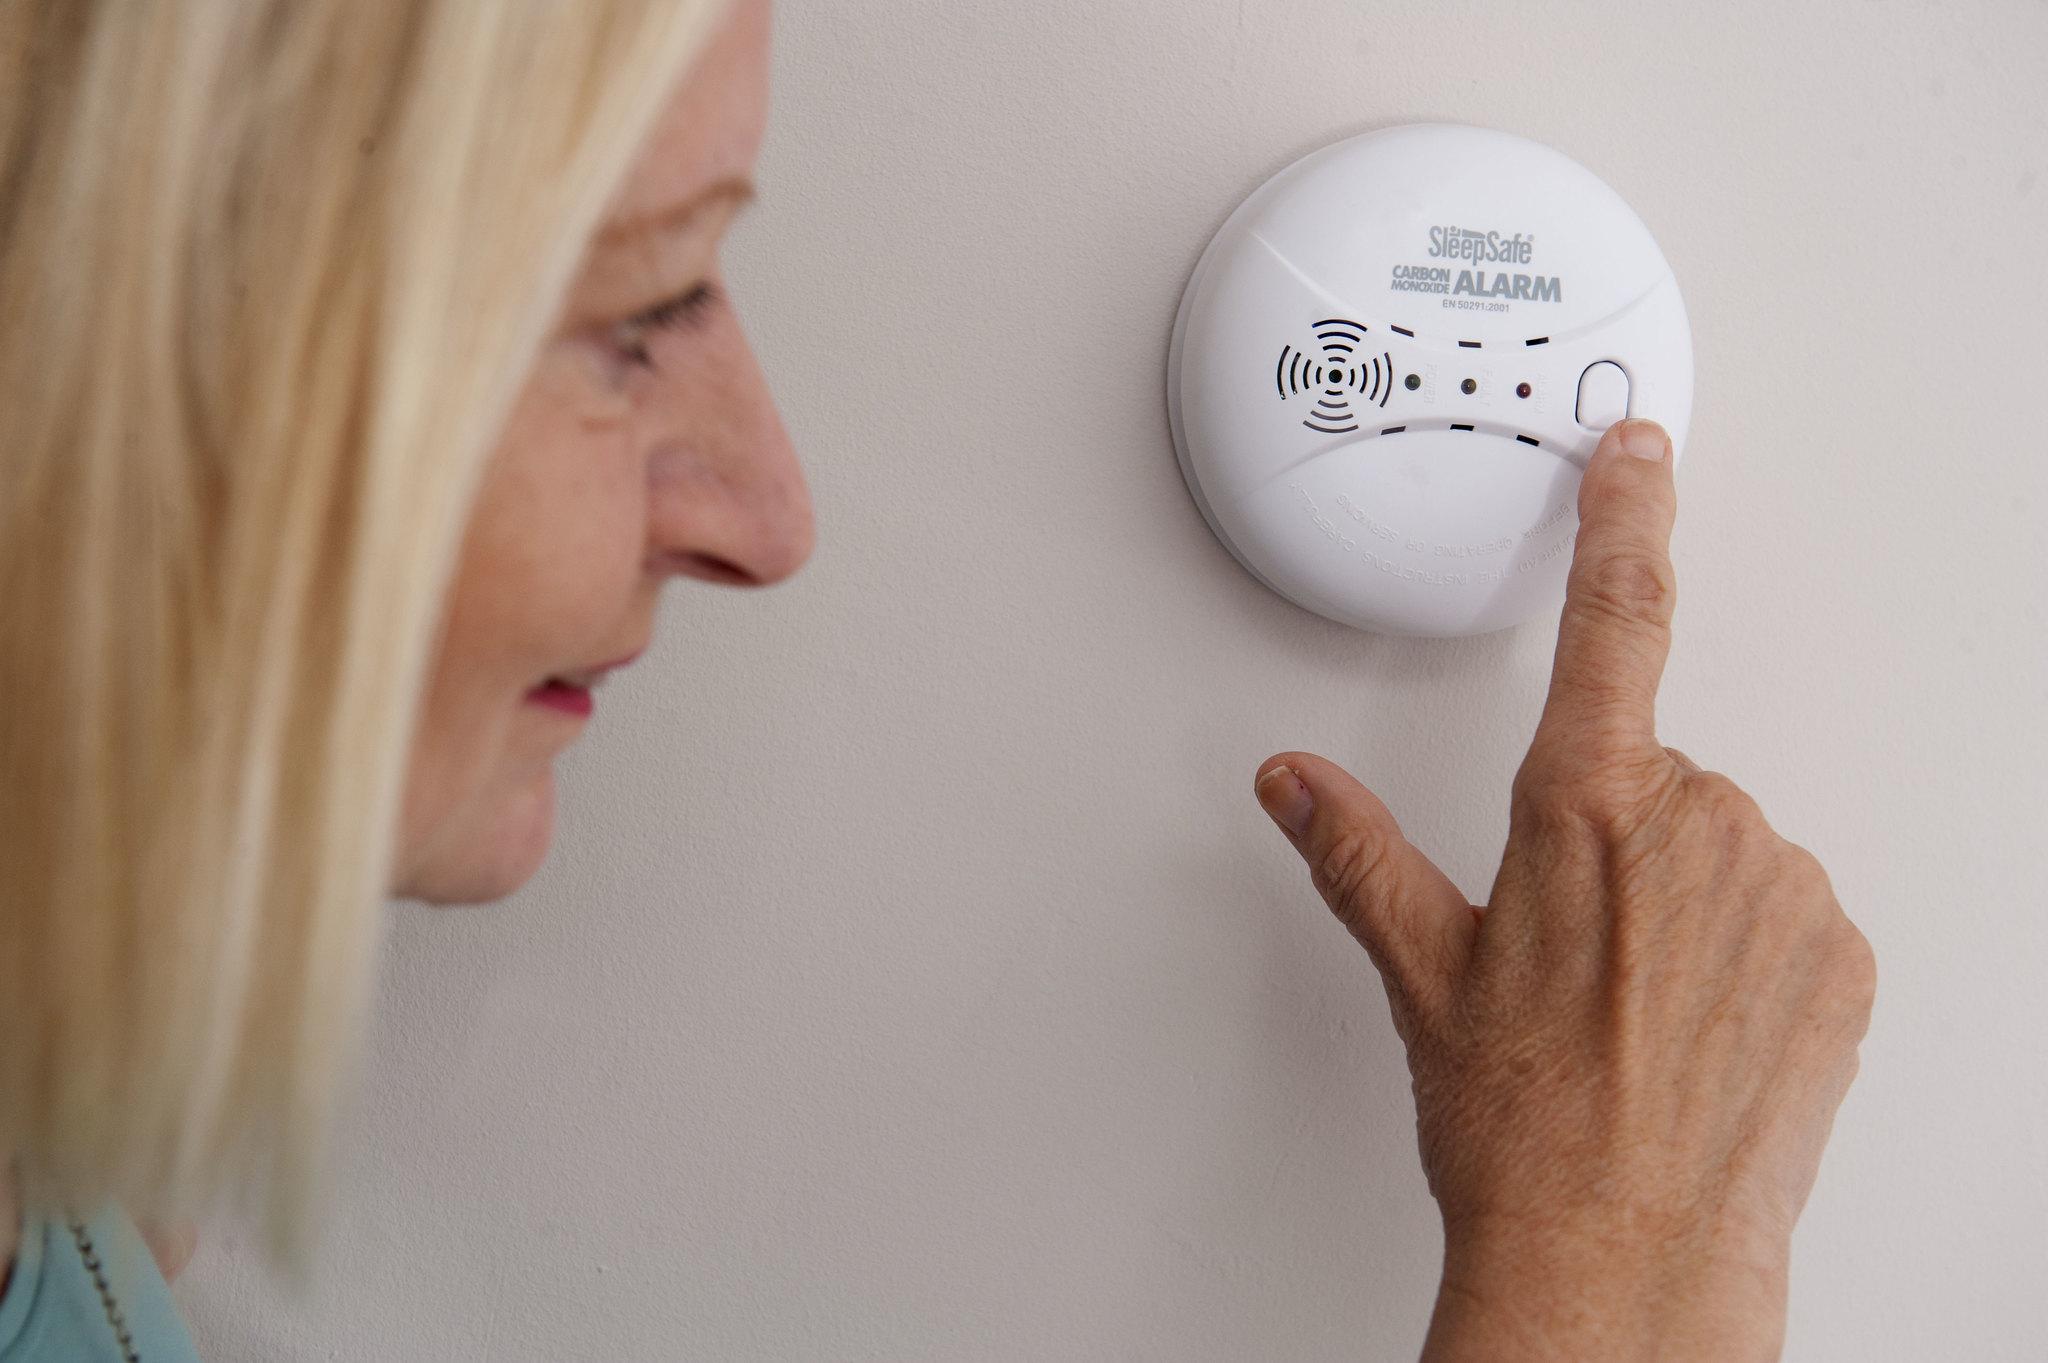 Lady checking a carbon monoxide alarm